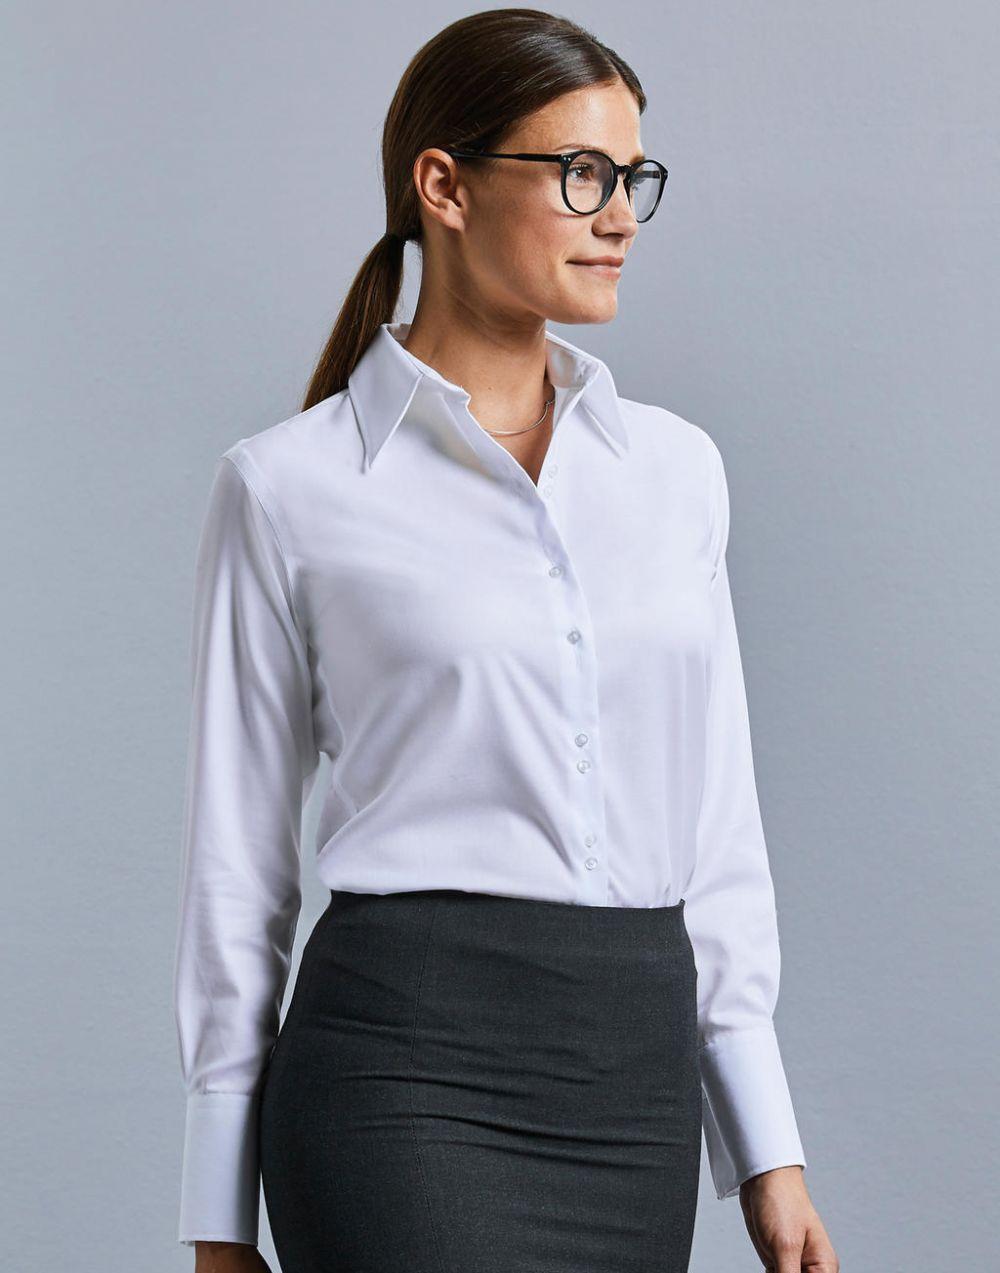 Camisas manga larga russell manga larga ultimate mujer con logo vista 1